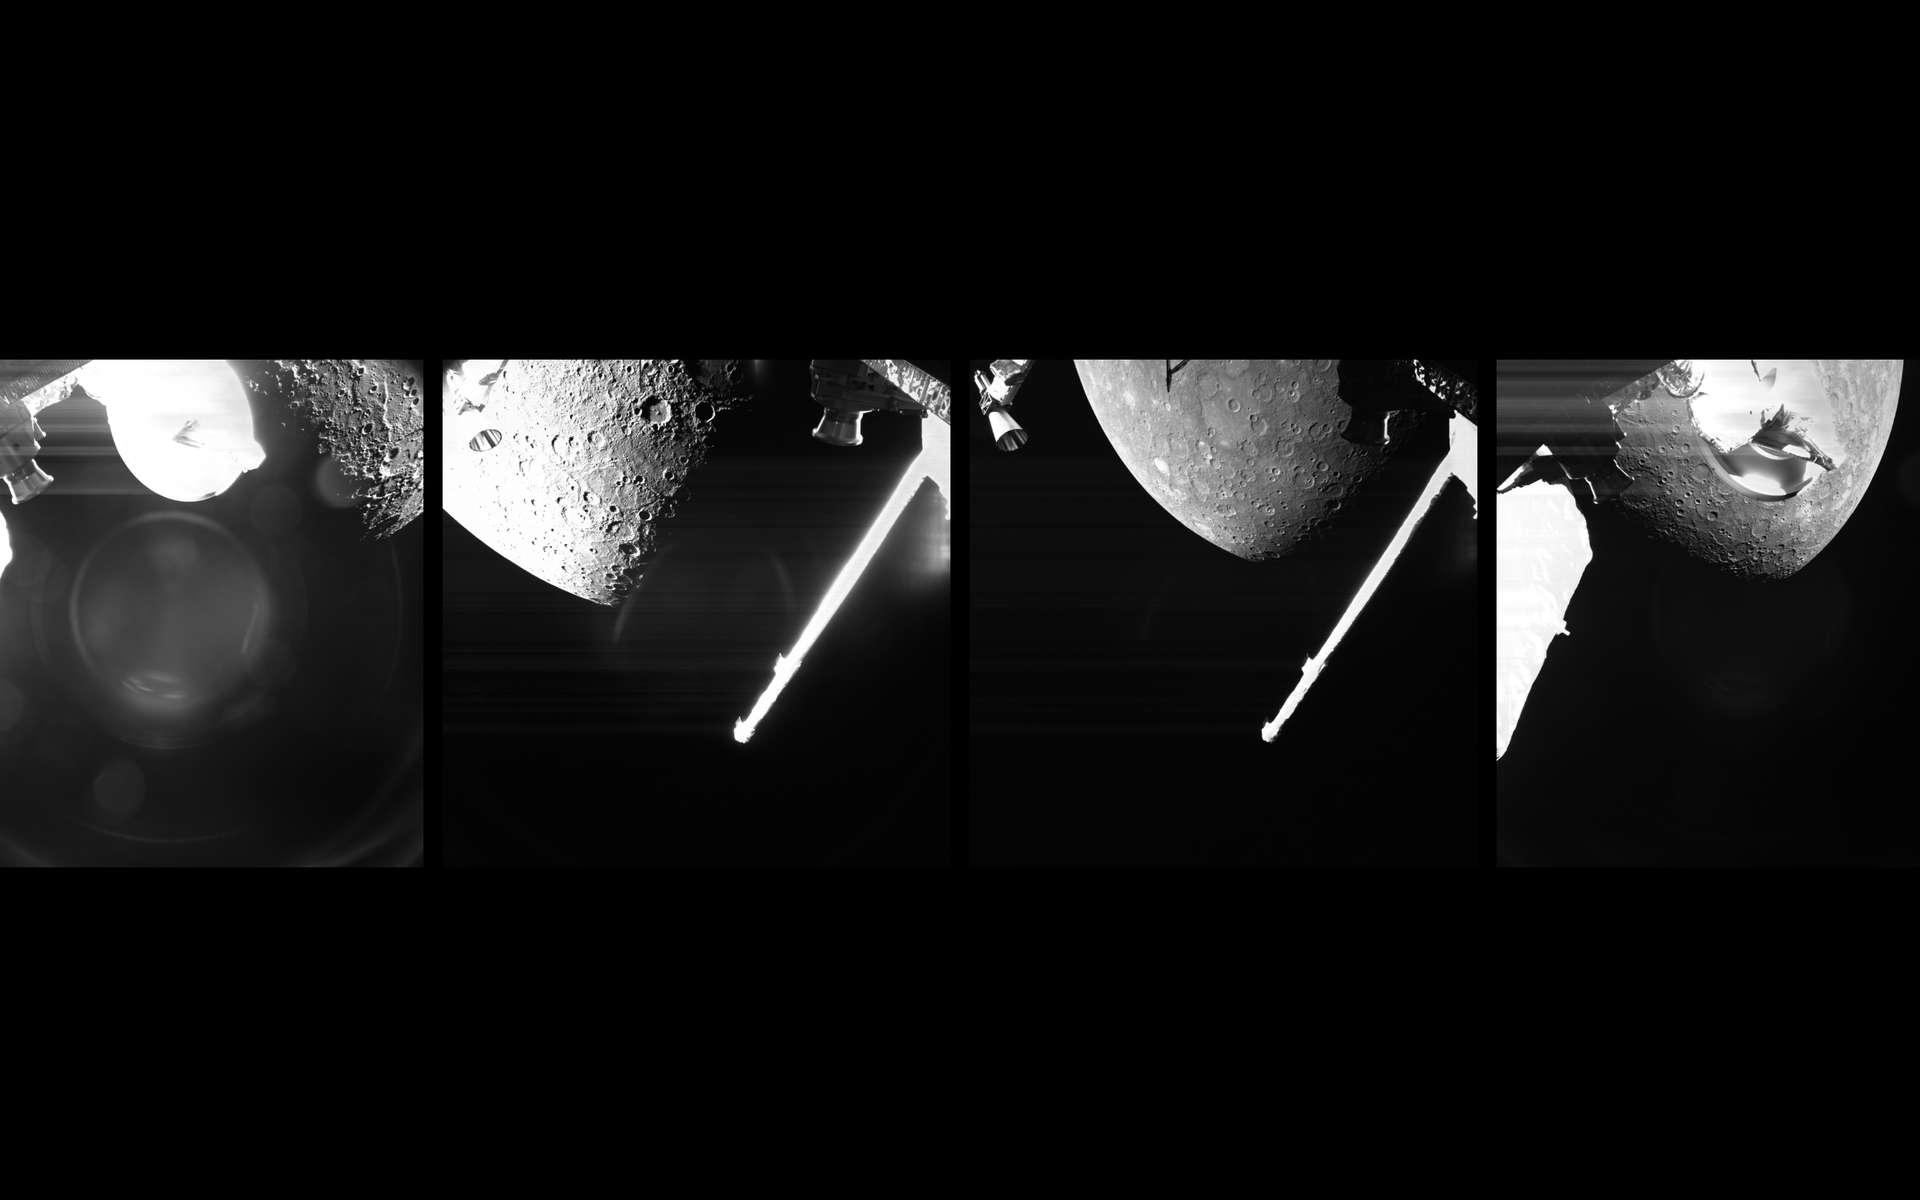 Mercure le 1er octobre lors du premier survol de la sonde spatiale BepiColombo. © ESA, BepiColombo, MTM, CC BY-SA 3.0 IGO